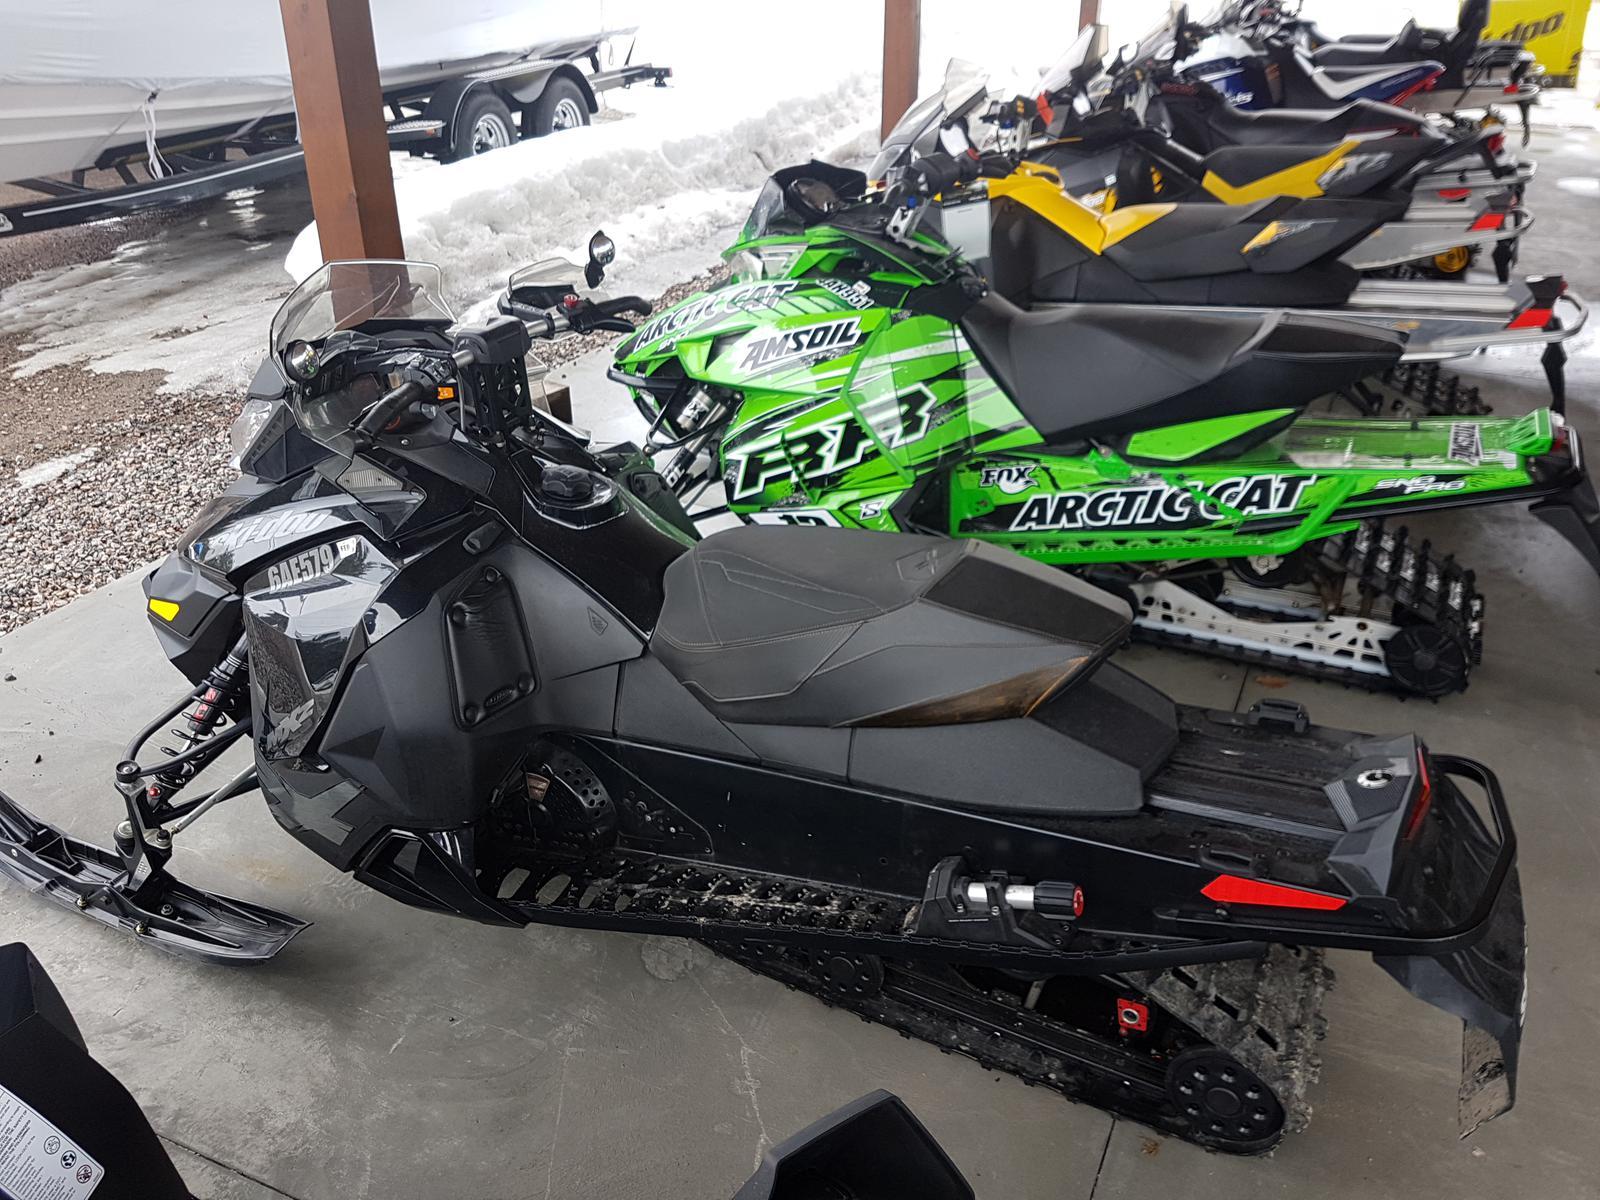 2014 Ski Doo MXZ X 800 E-TEC | 1 of 2